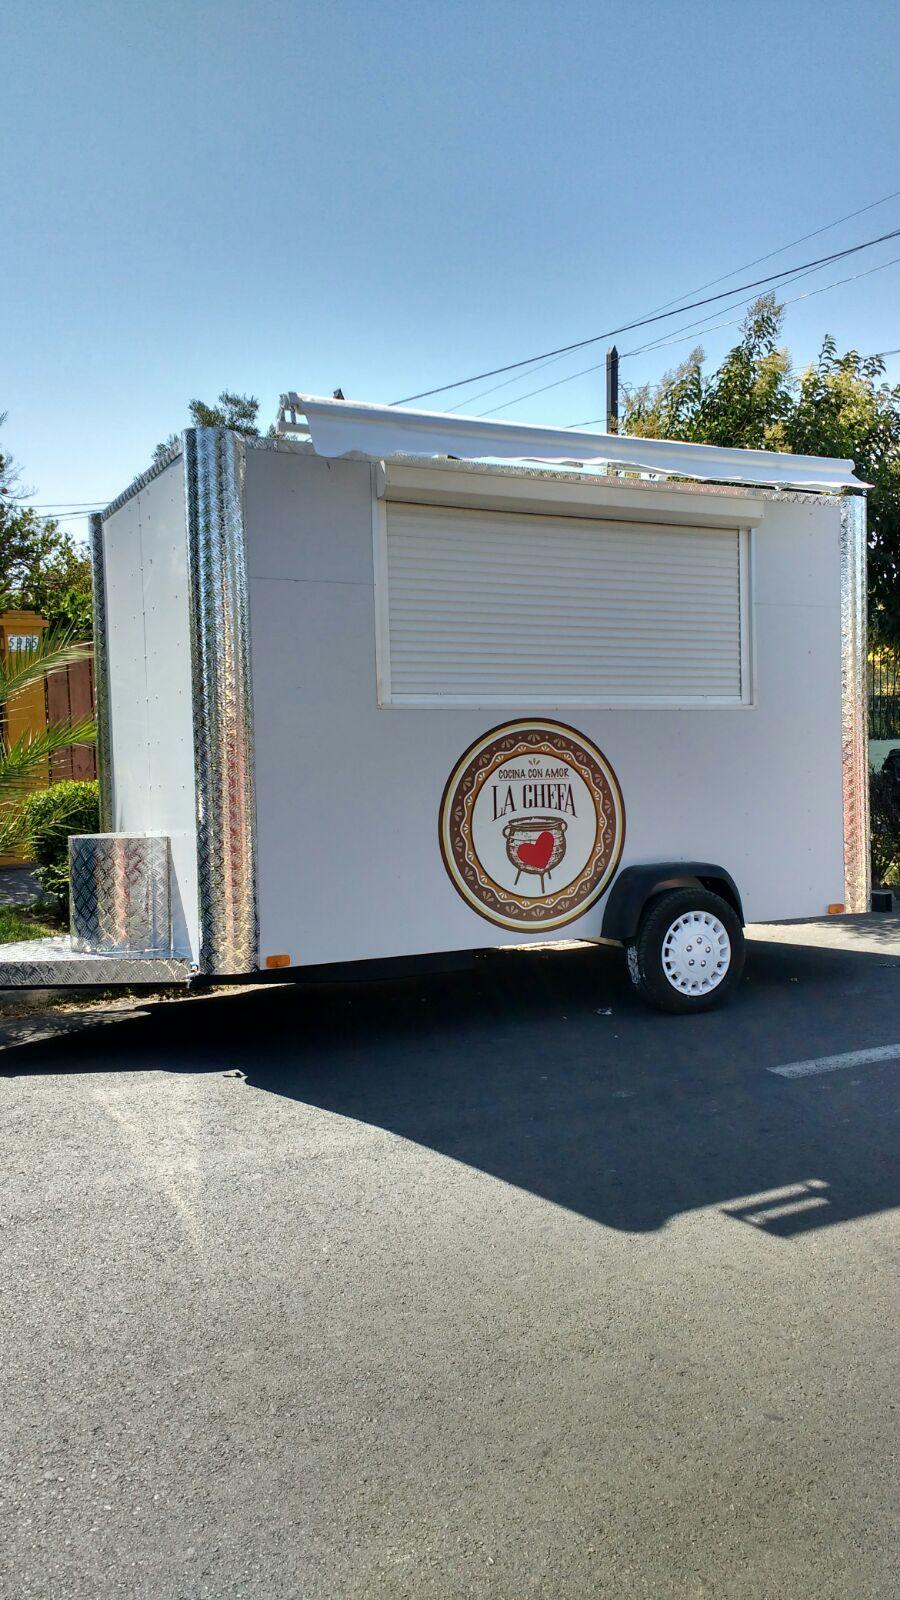 Perfil De Fornecedor De Food Truck